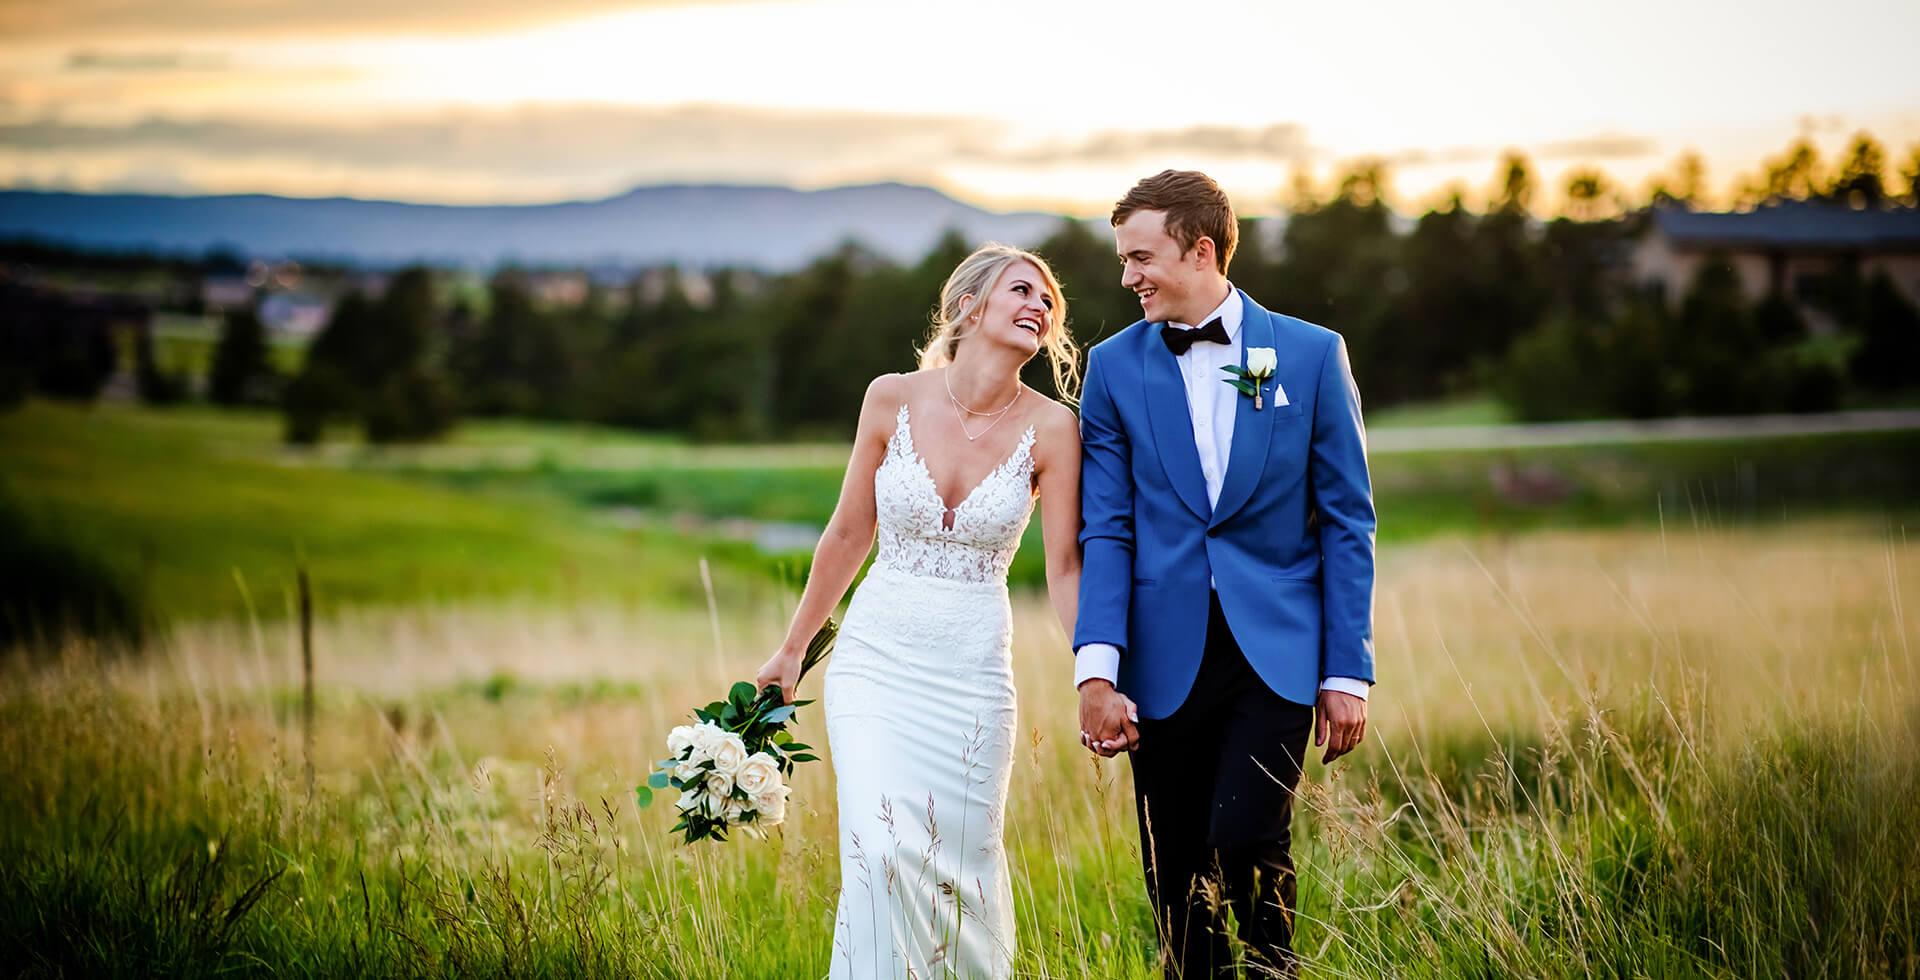 This Maine Wedding Photographer